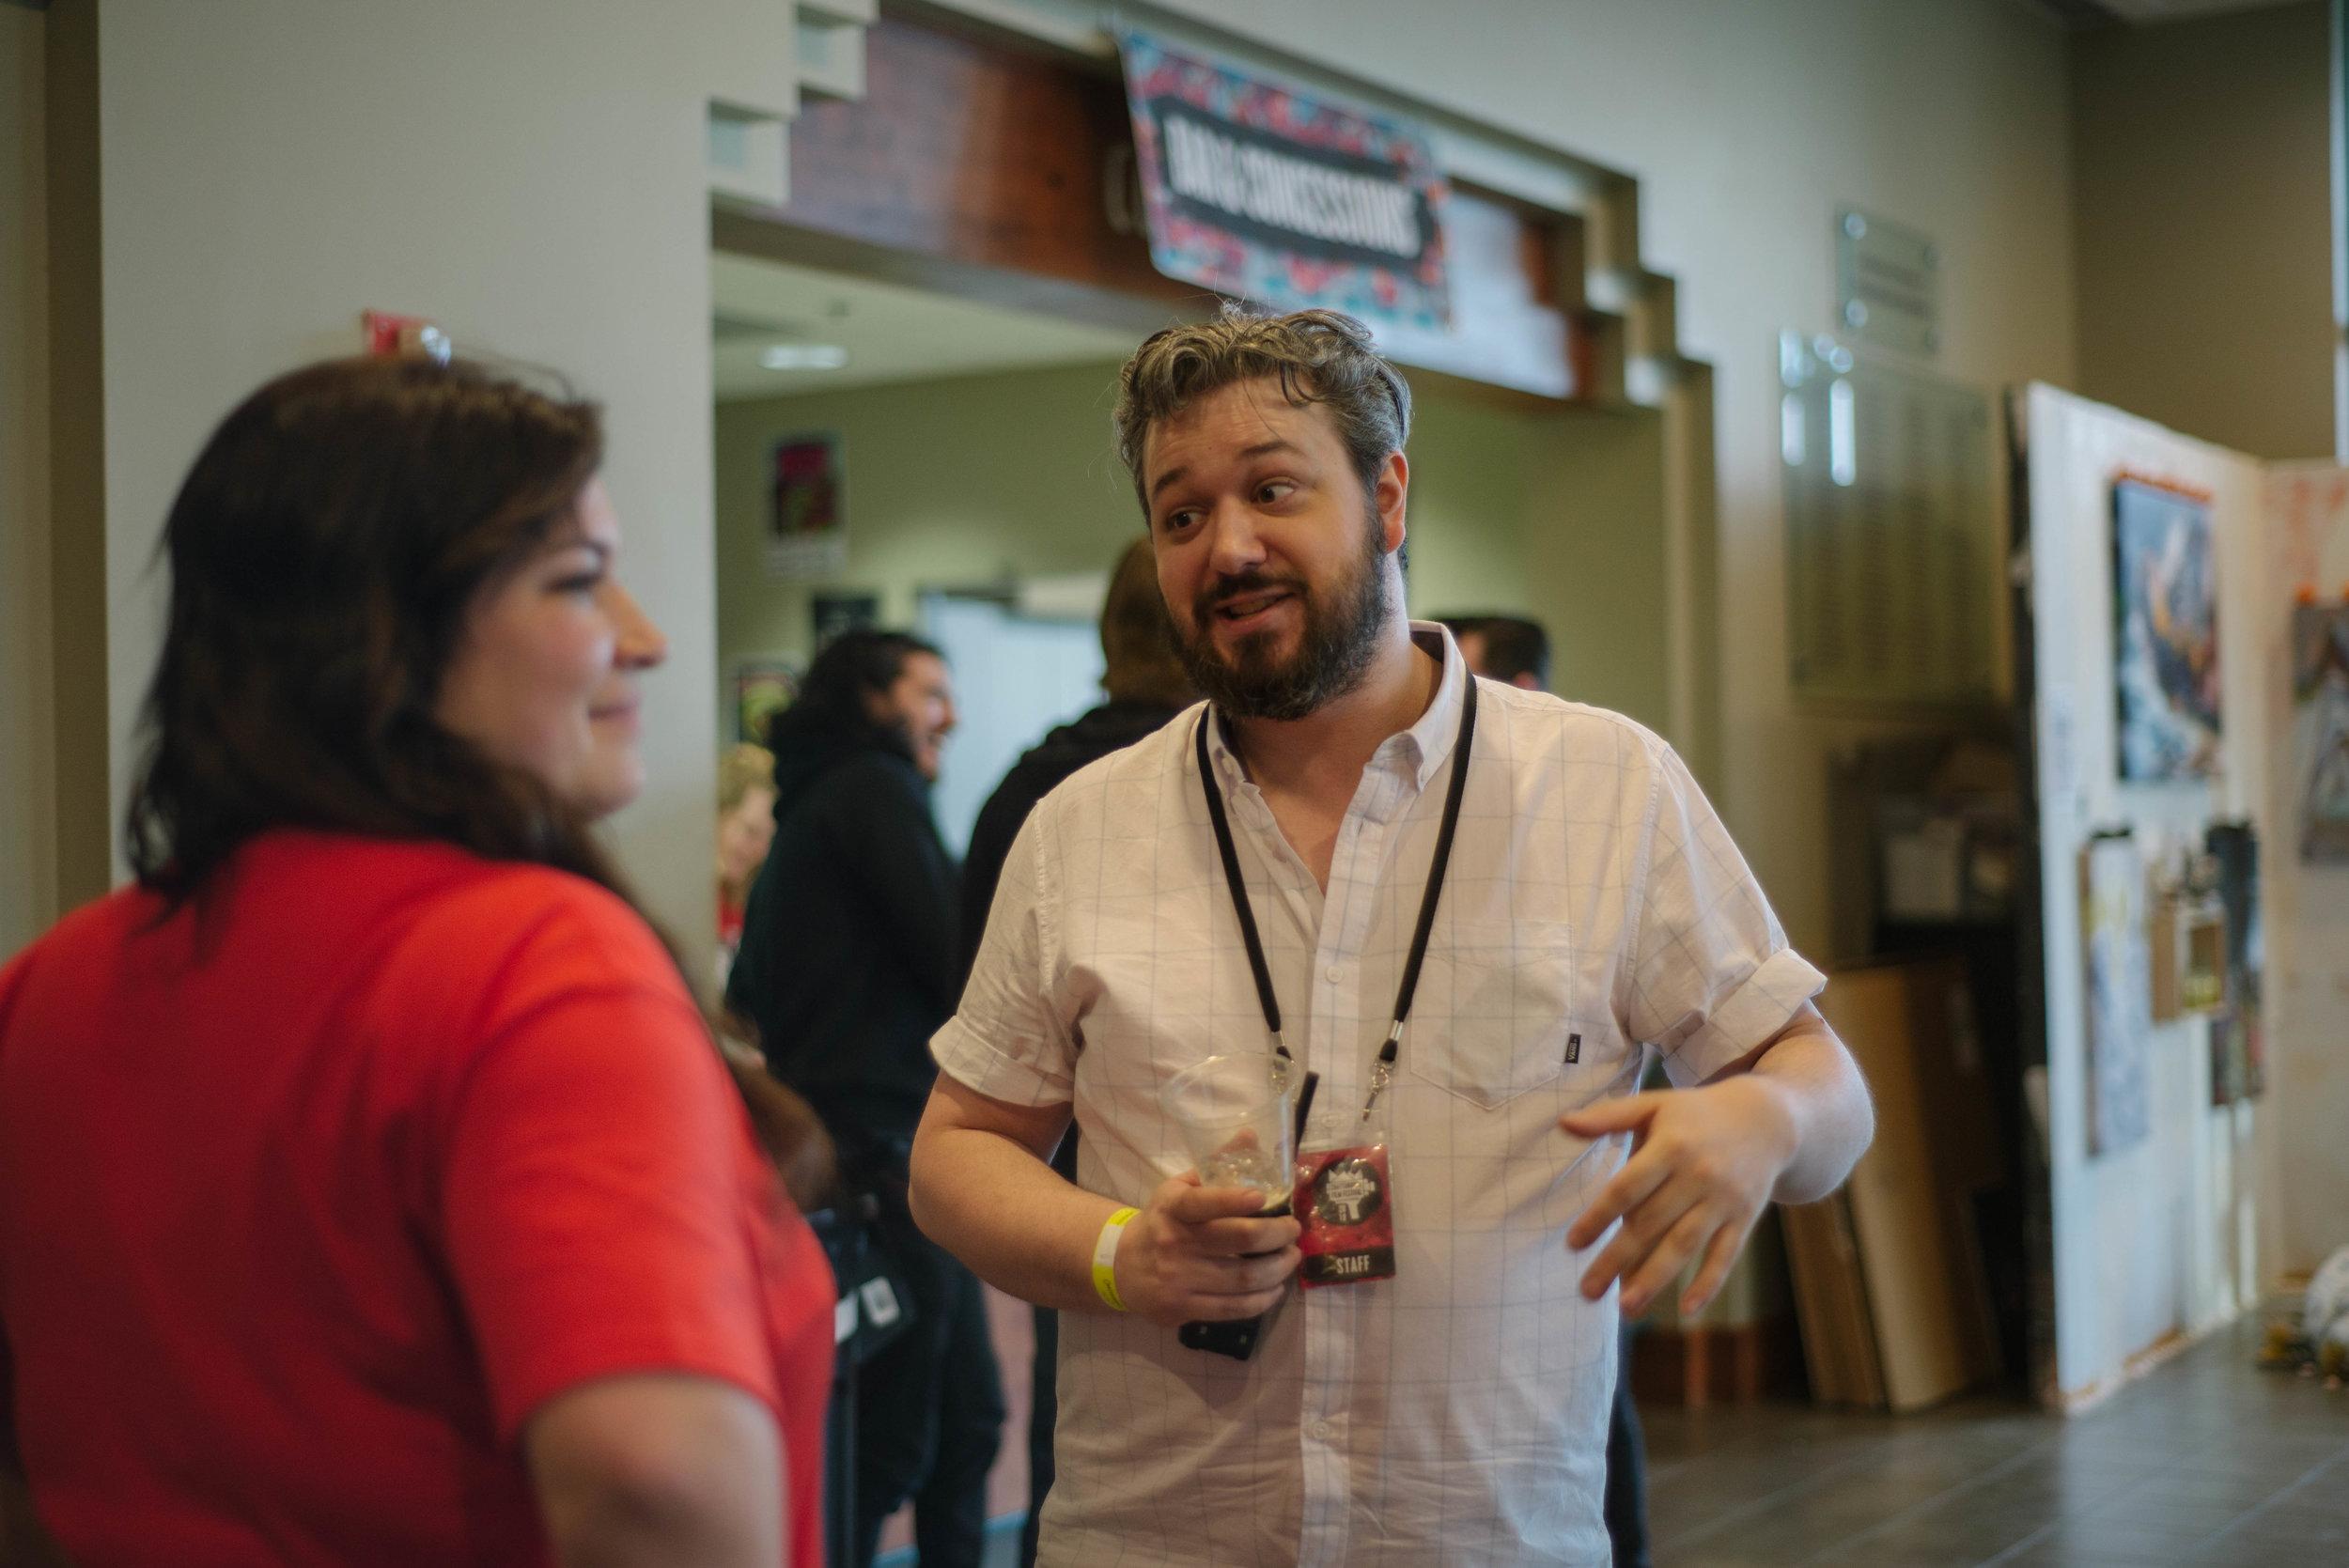 Chattanooga Film Festival executive director and lead programmer Chris Dortch. (Photo: Sania Kahn)